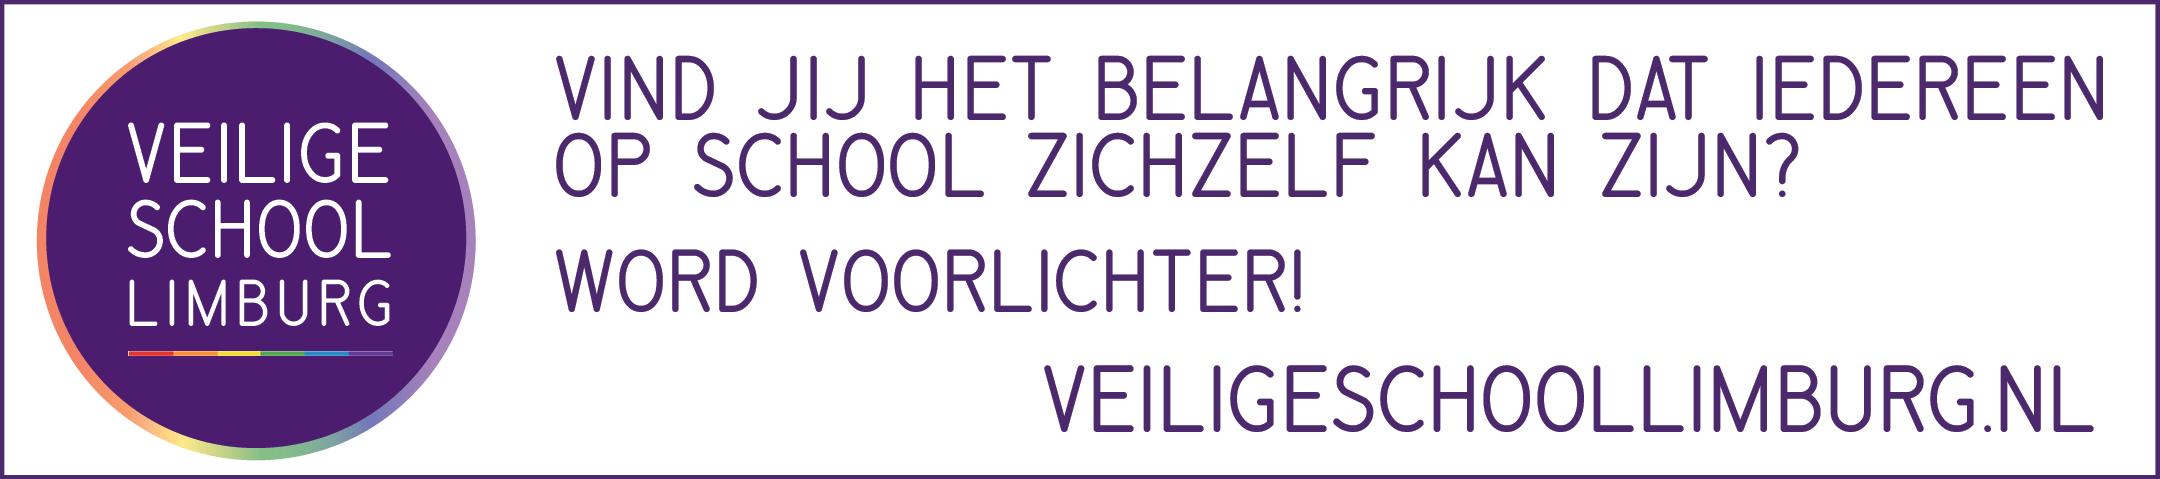 Veilige School Limburg